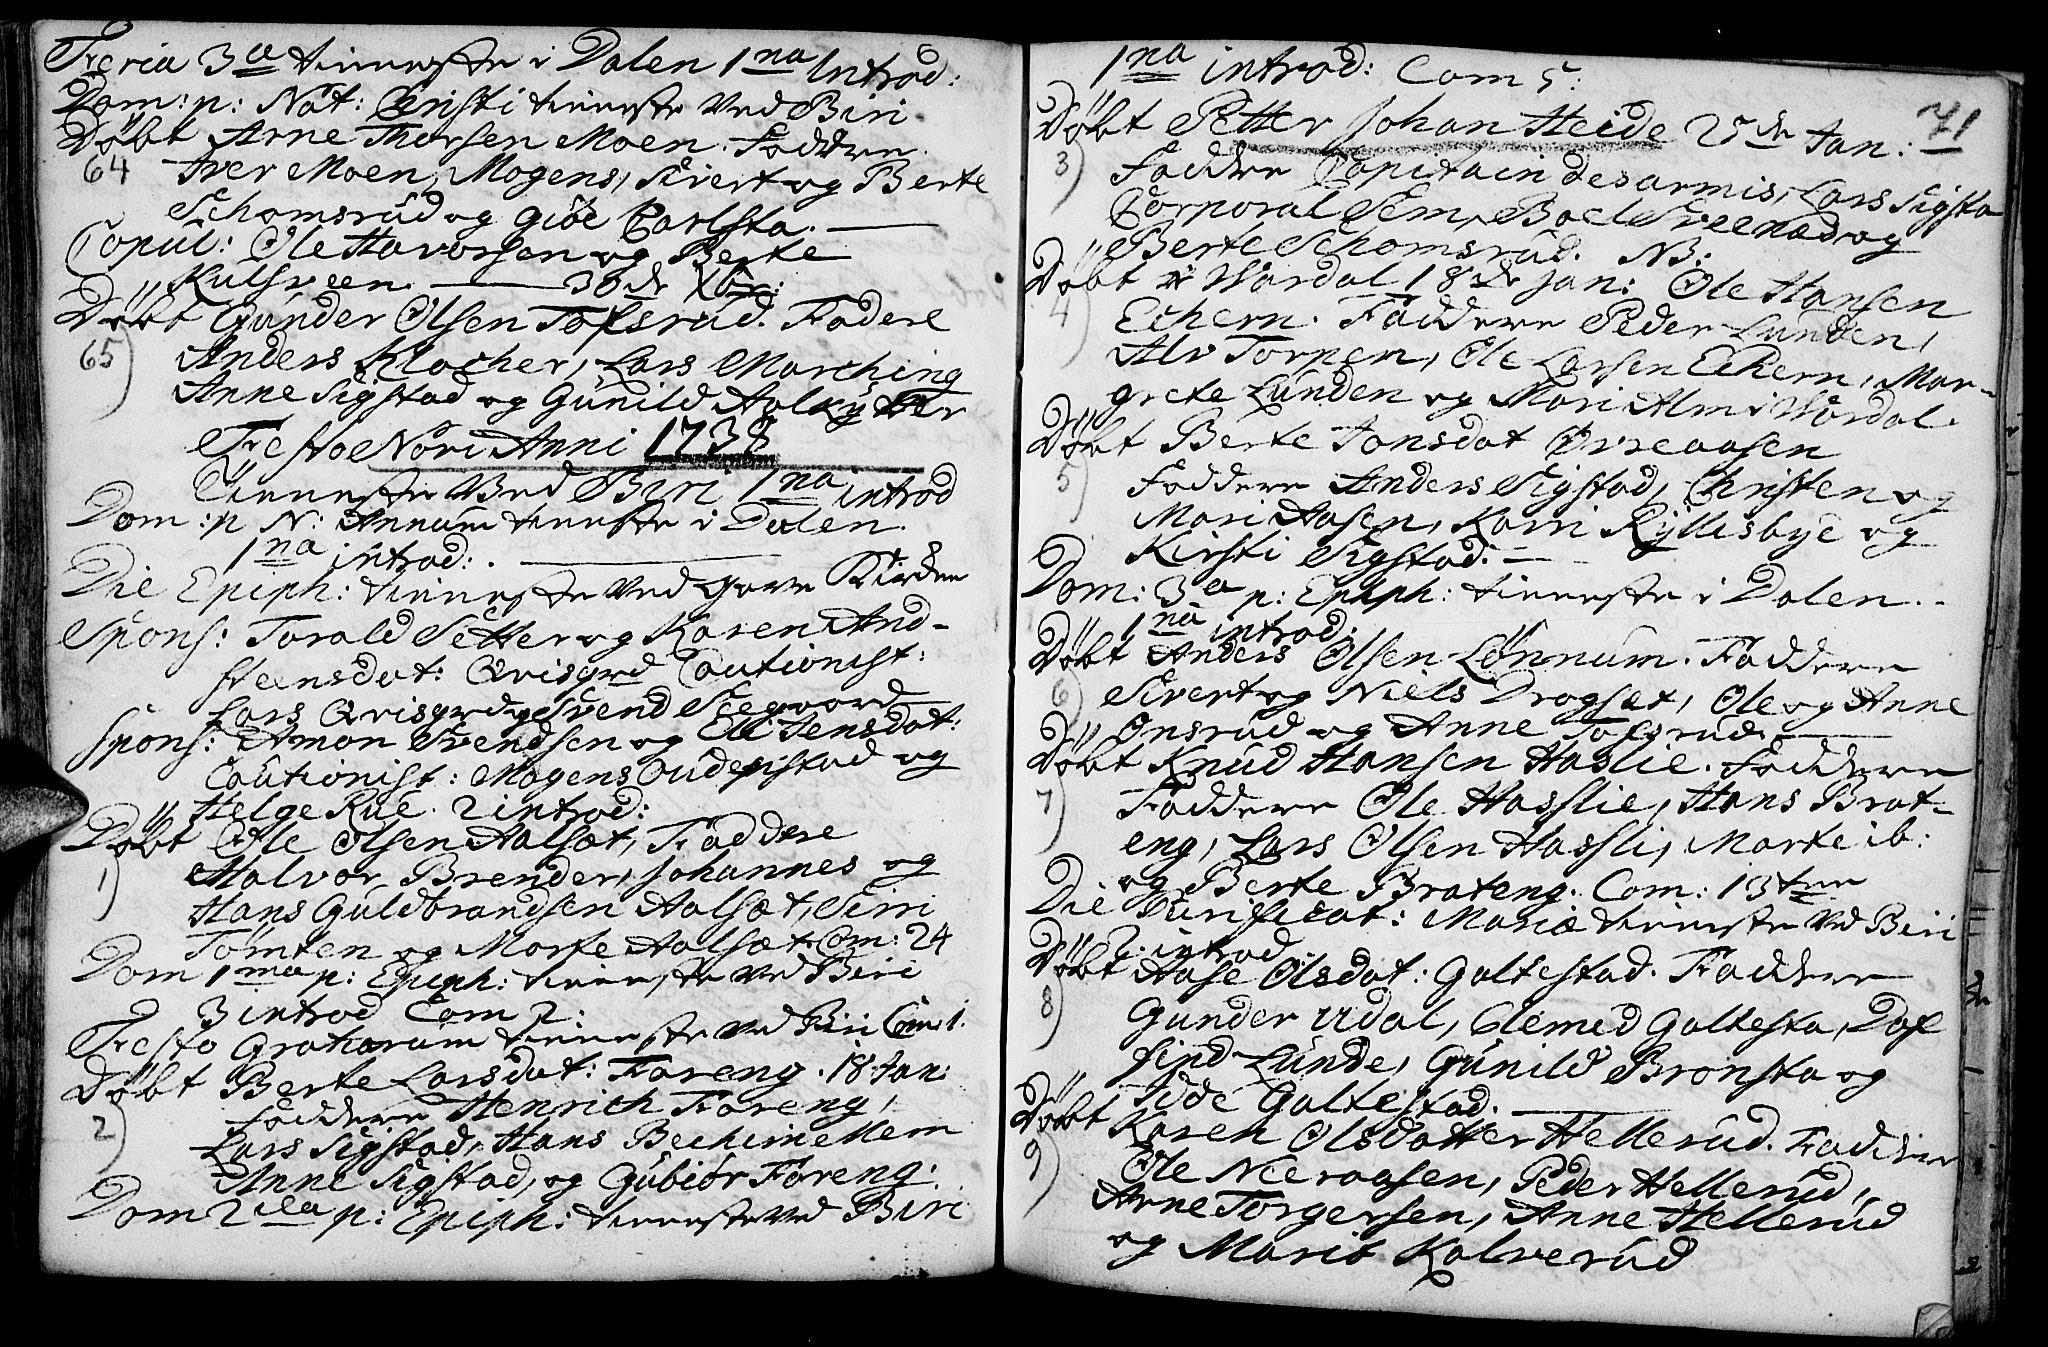 SAH, Biri prestekontor, Ministerialbok nr. 1, 1730-1754, s. 71